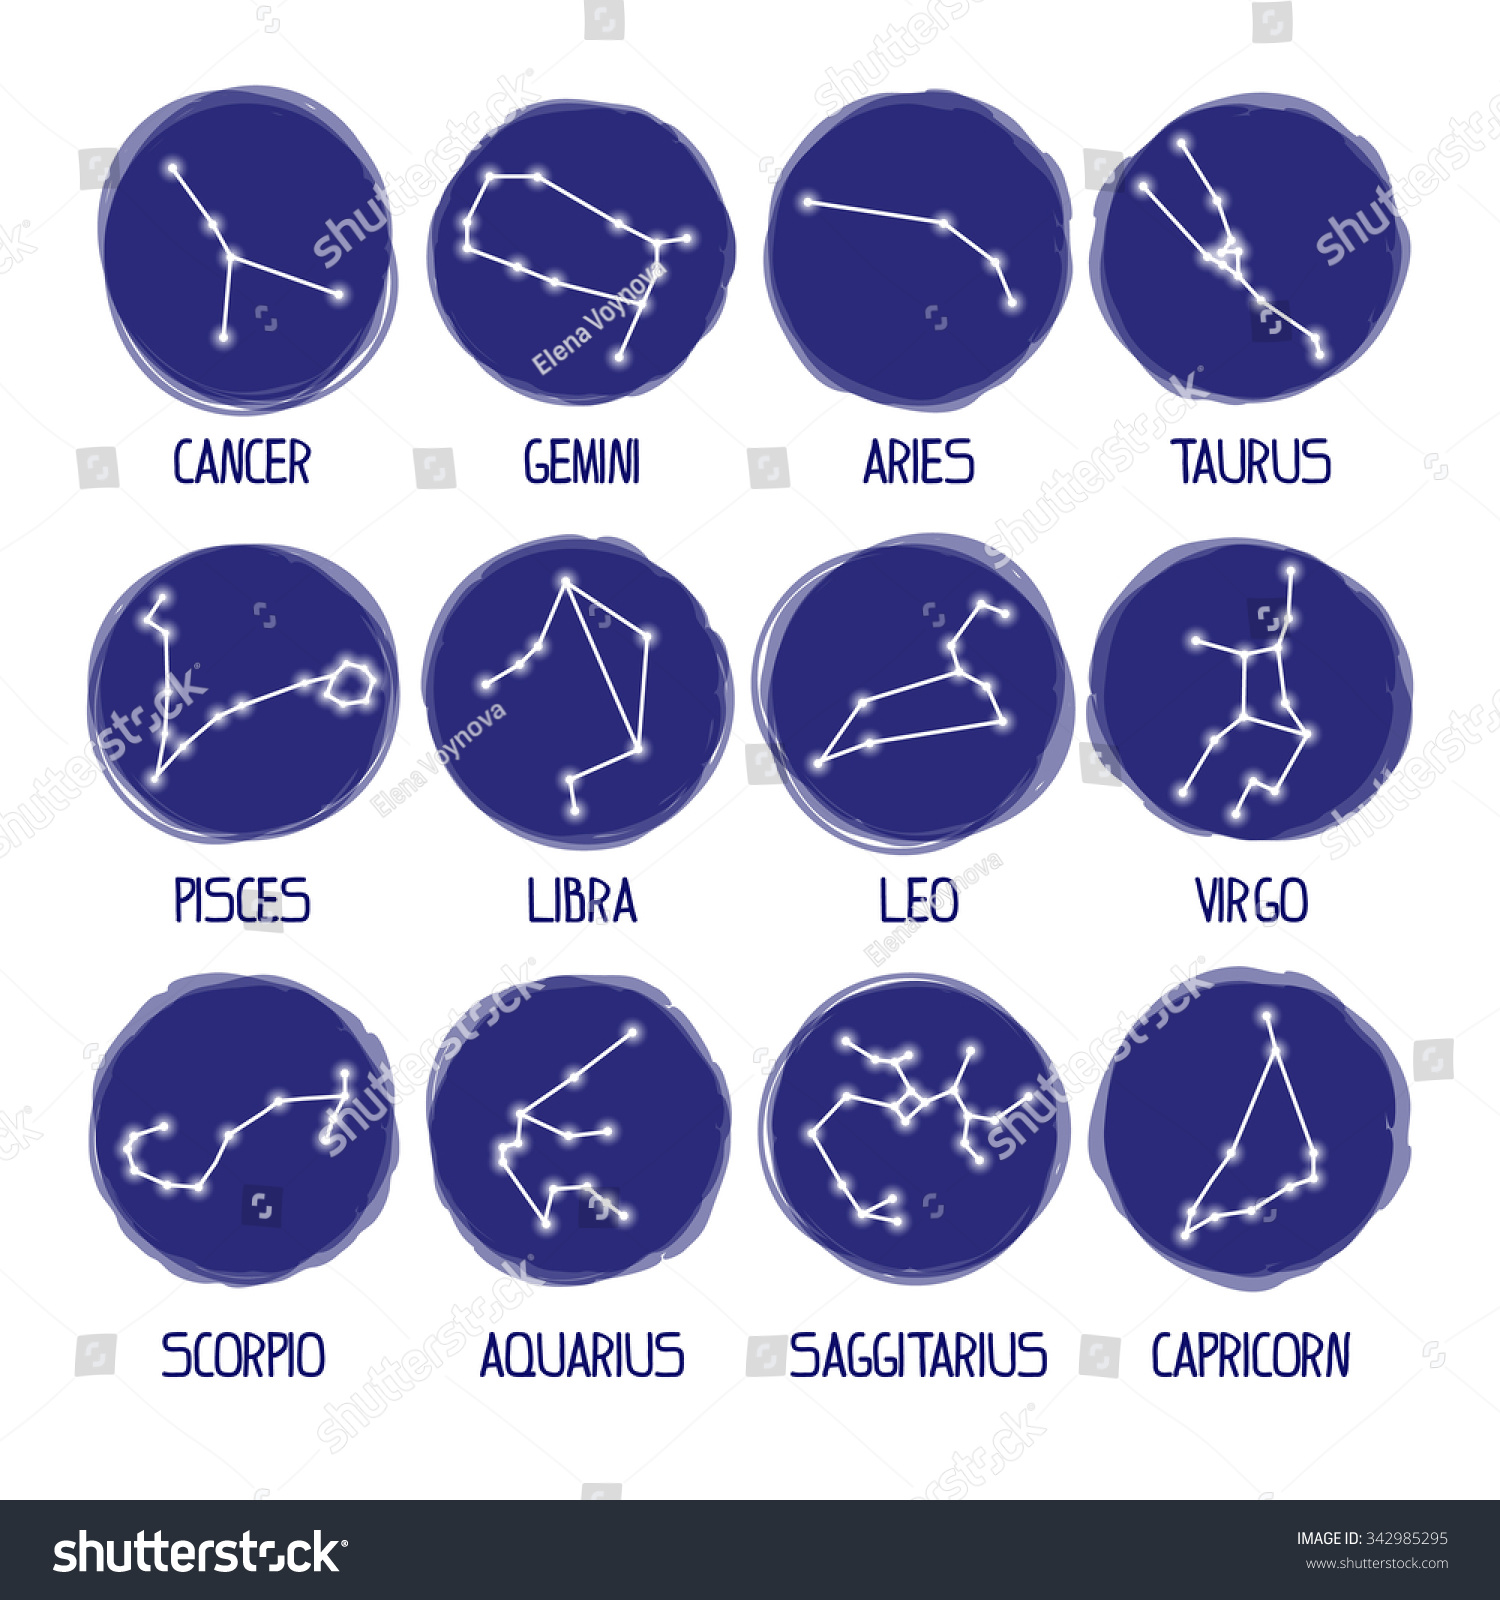 Astrology cancer hookup cancer astrology tattoos gemini